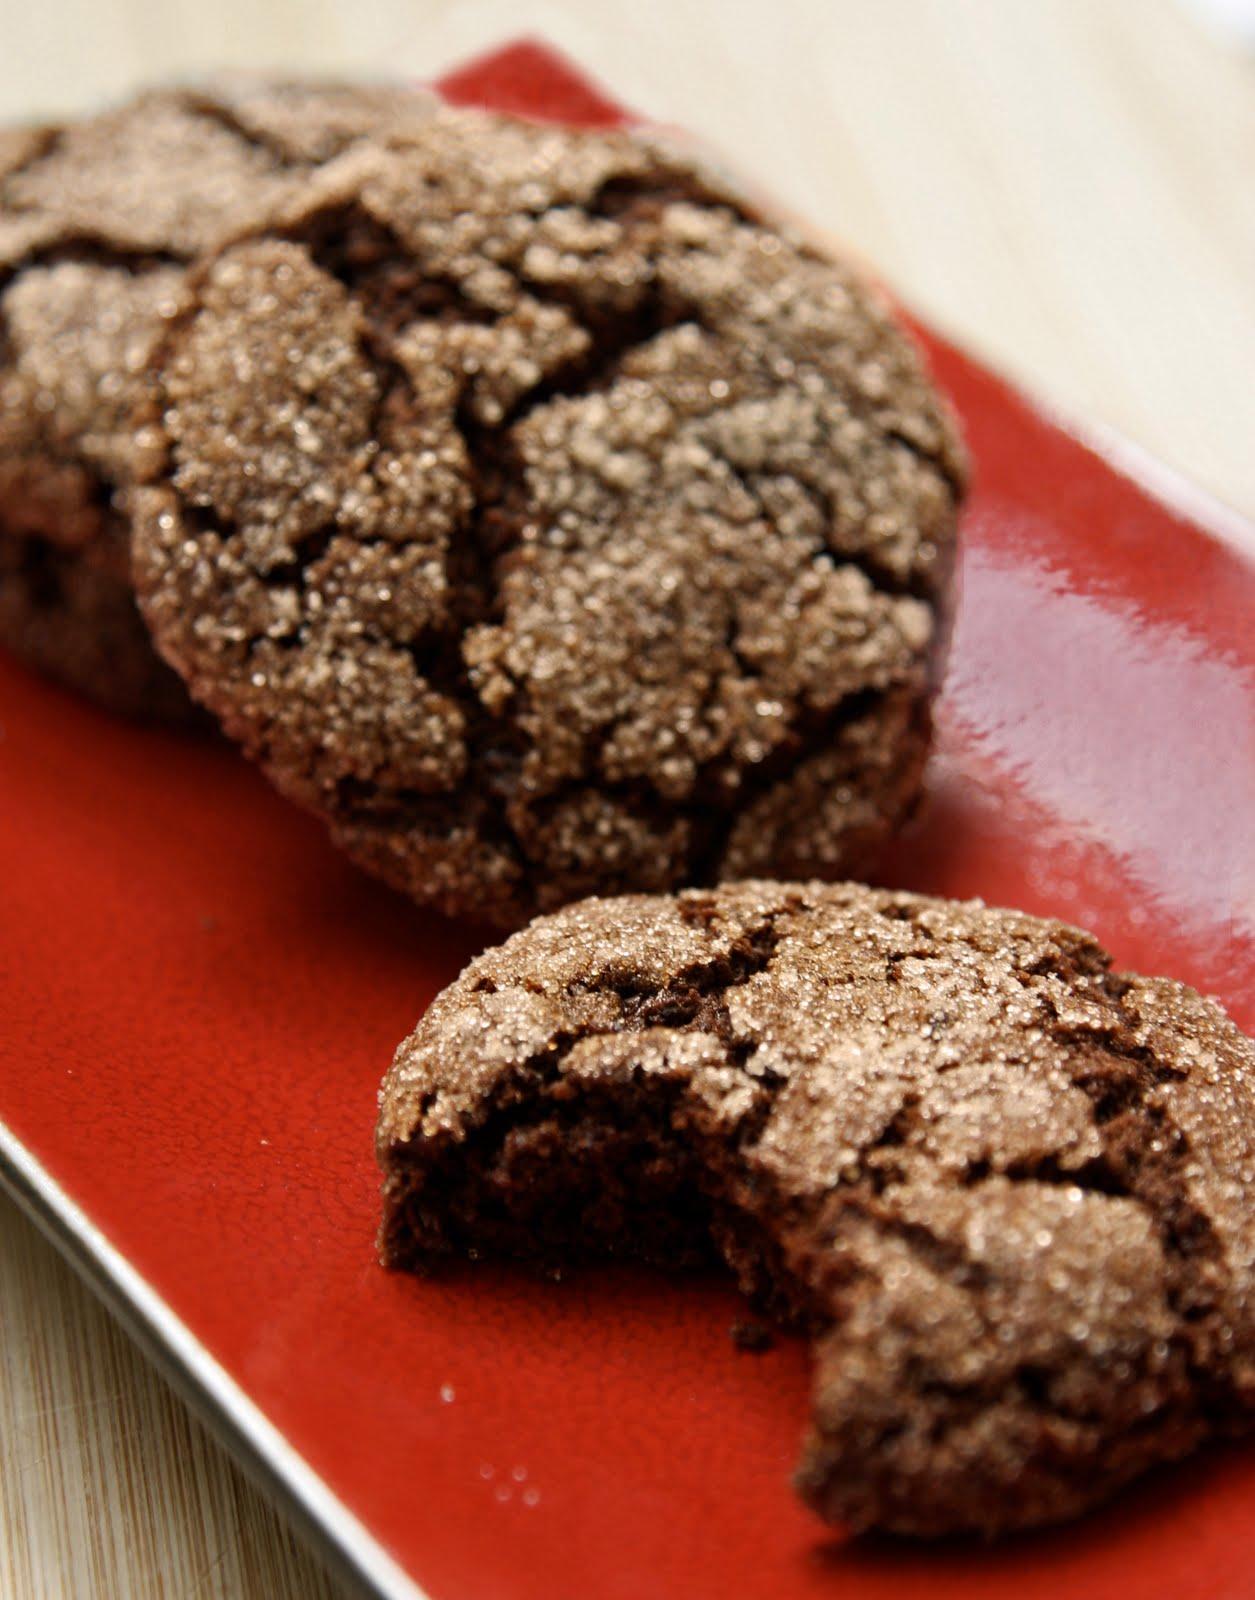 hanna's vegan kitchen: spicy, chewy ginger cookies